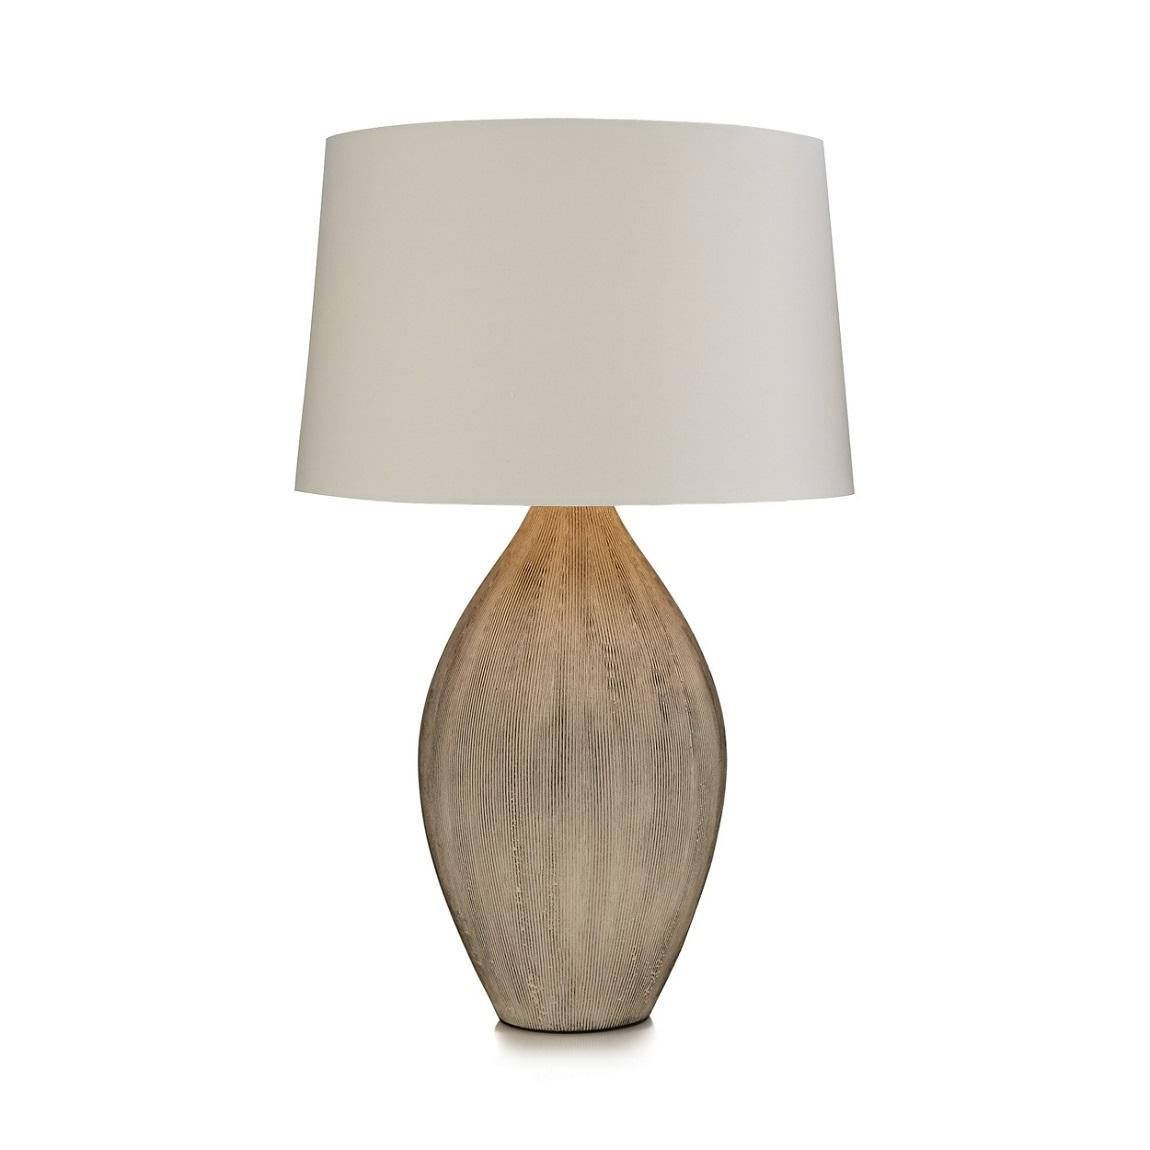 John-Rocha-Scraffito-Table-Lamp.jpg